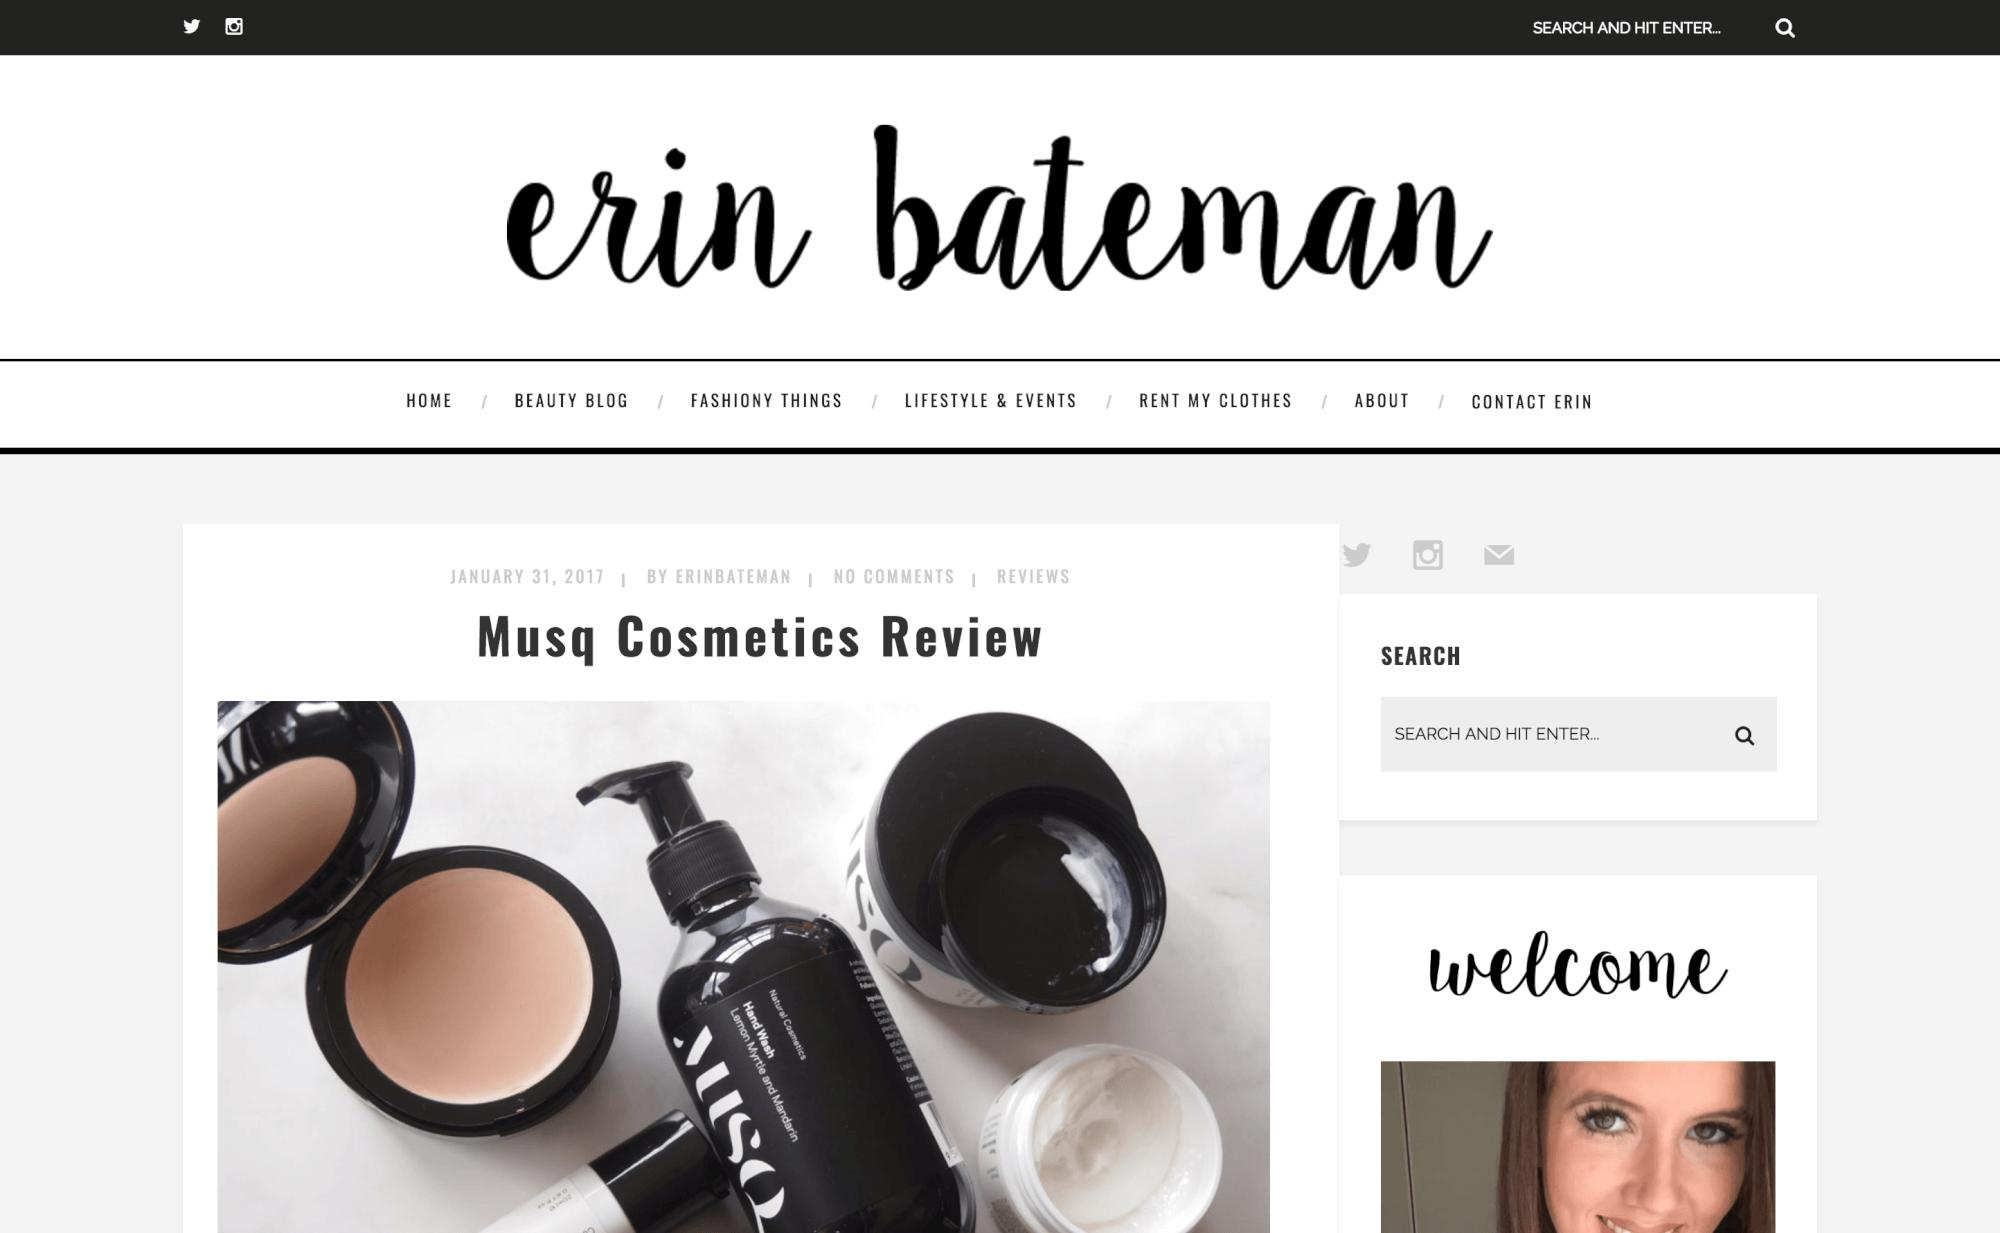 Erin Bateman Musq Cosmetics